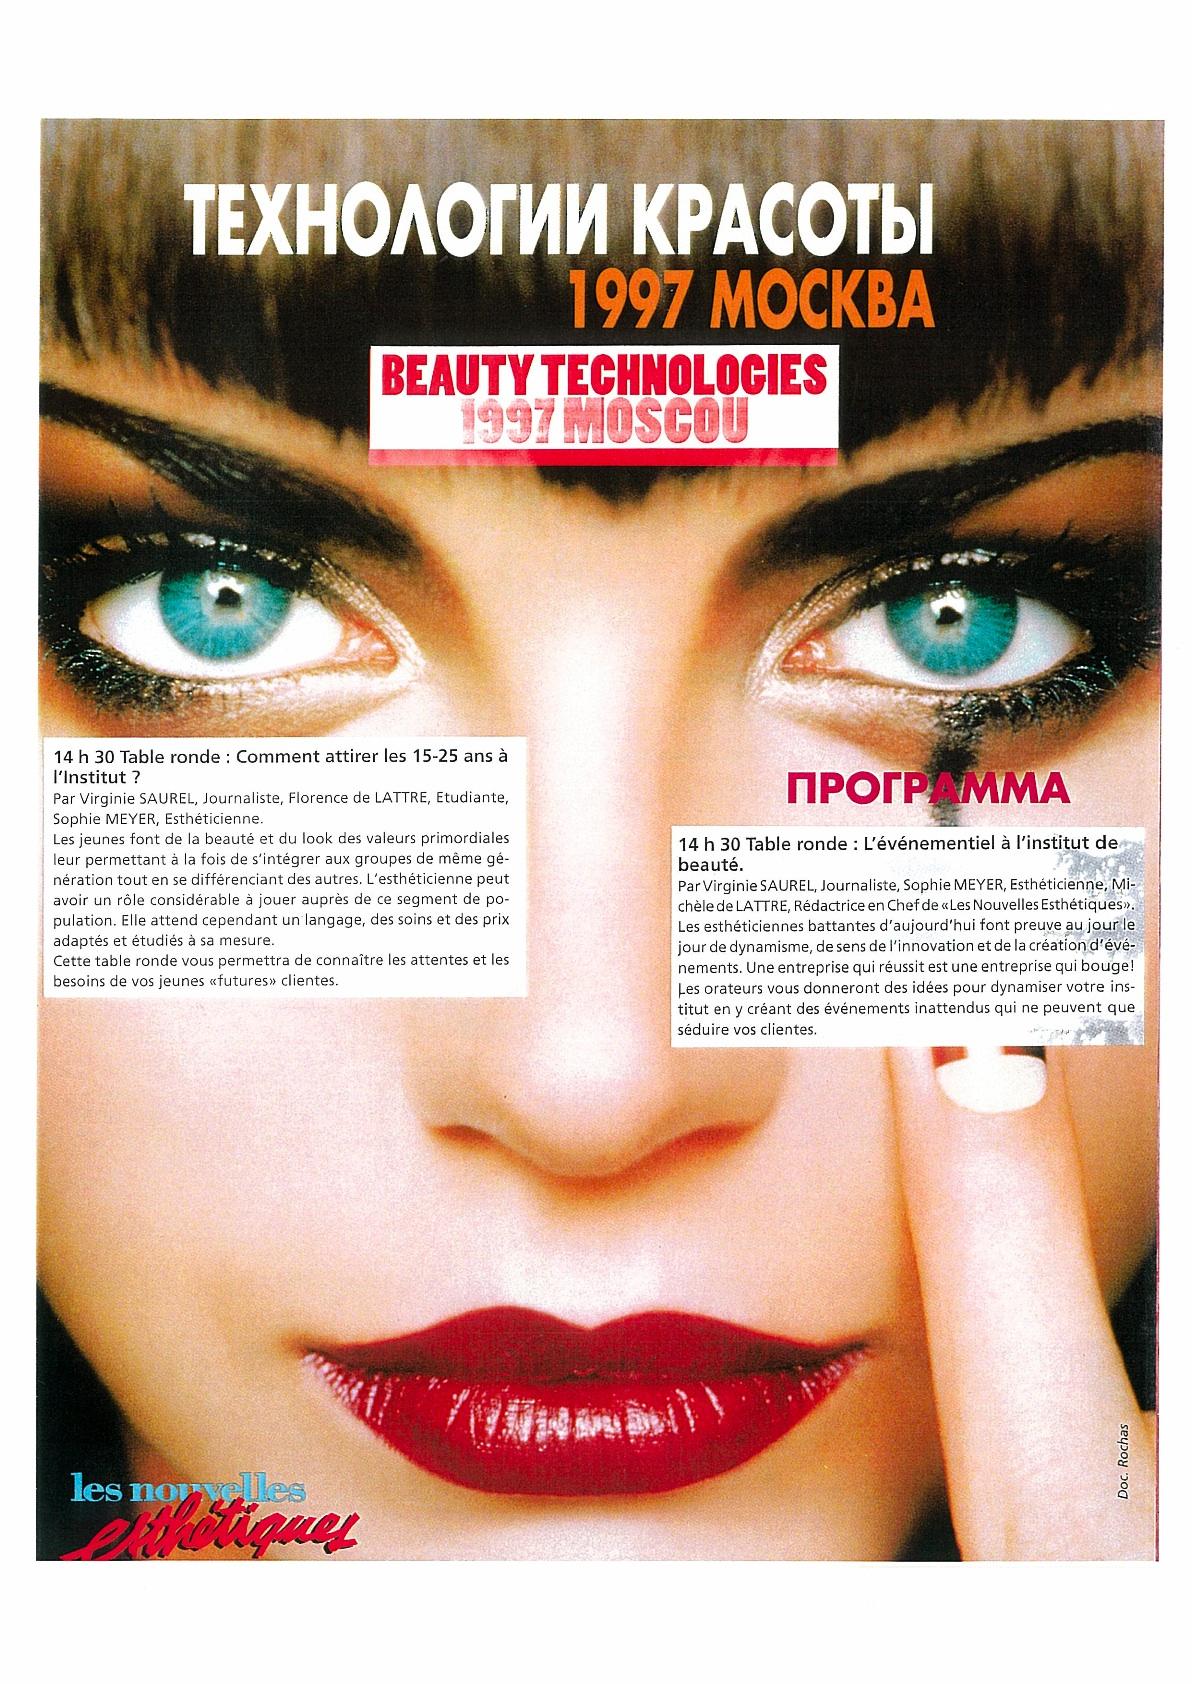 Moscou 97